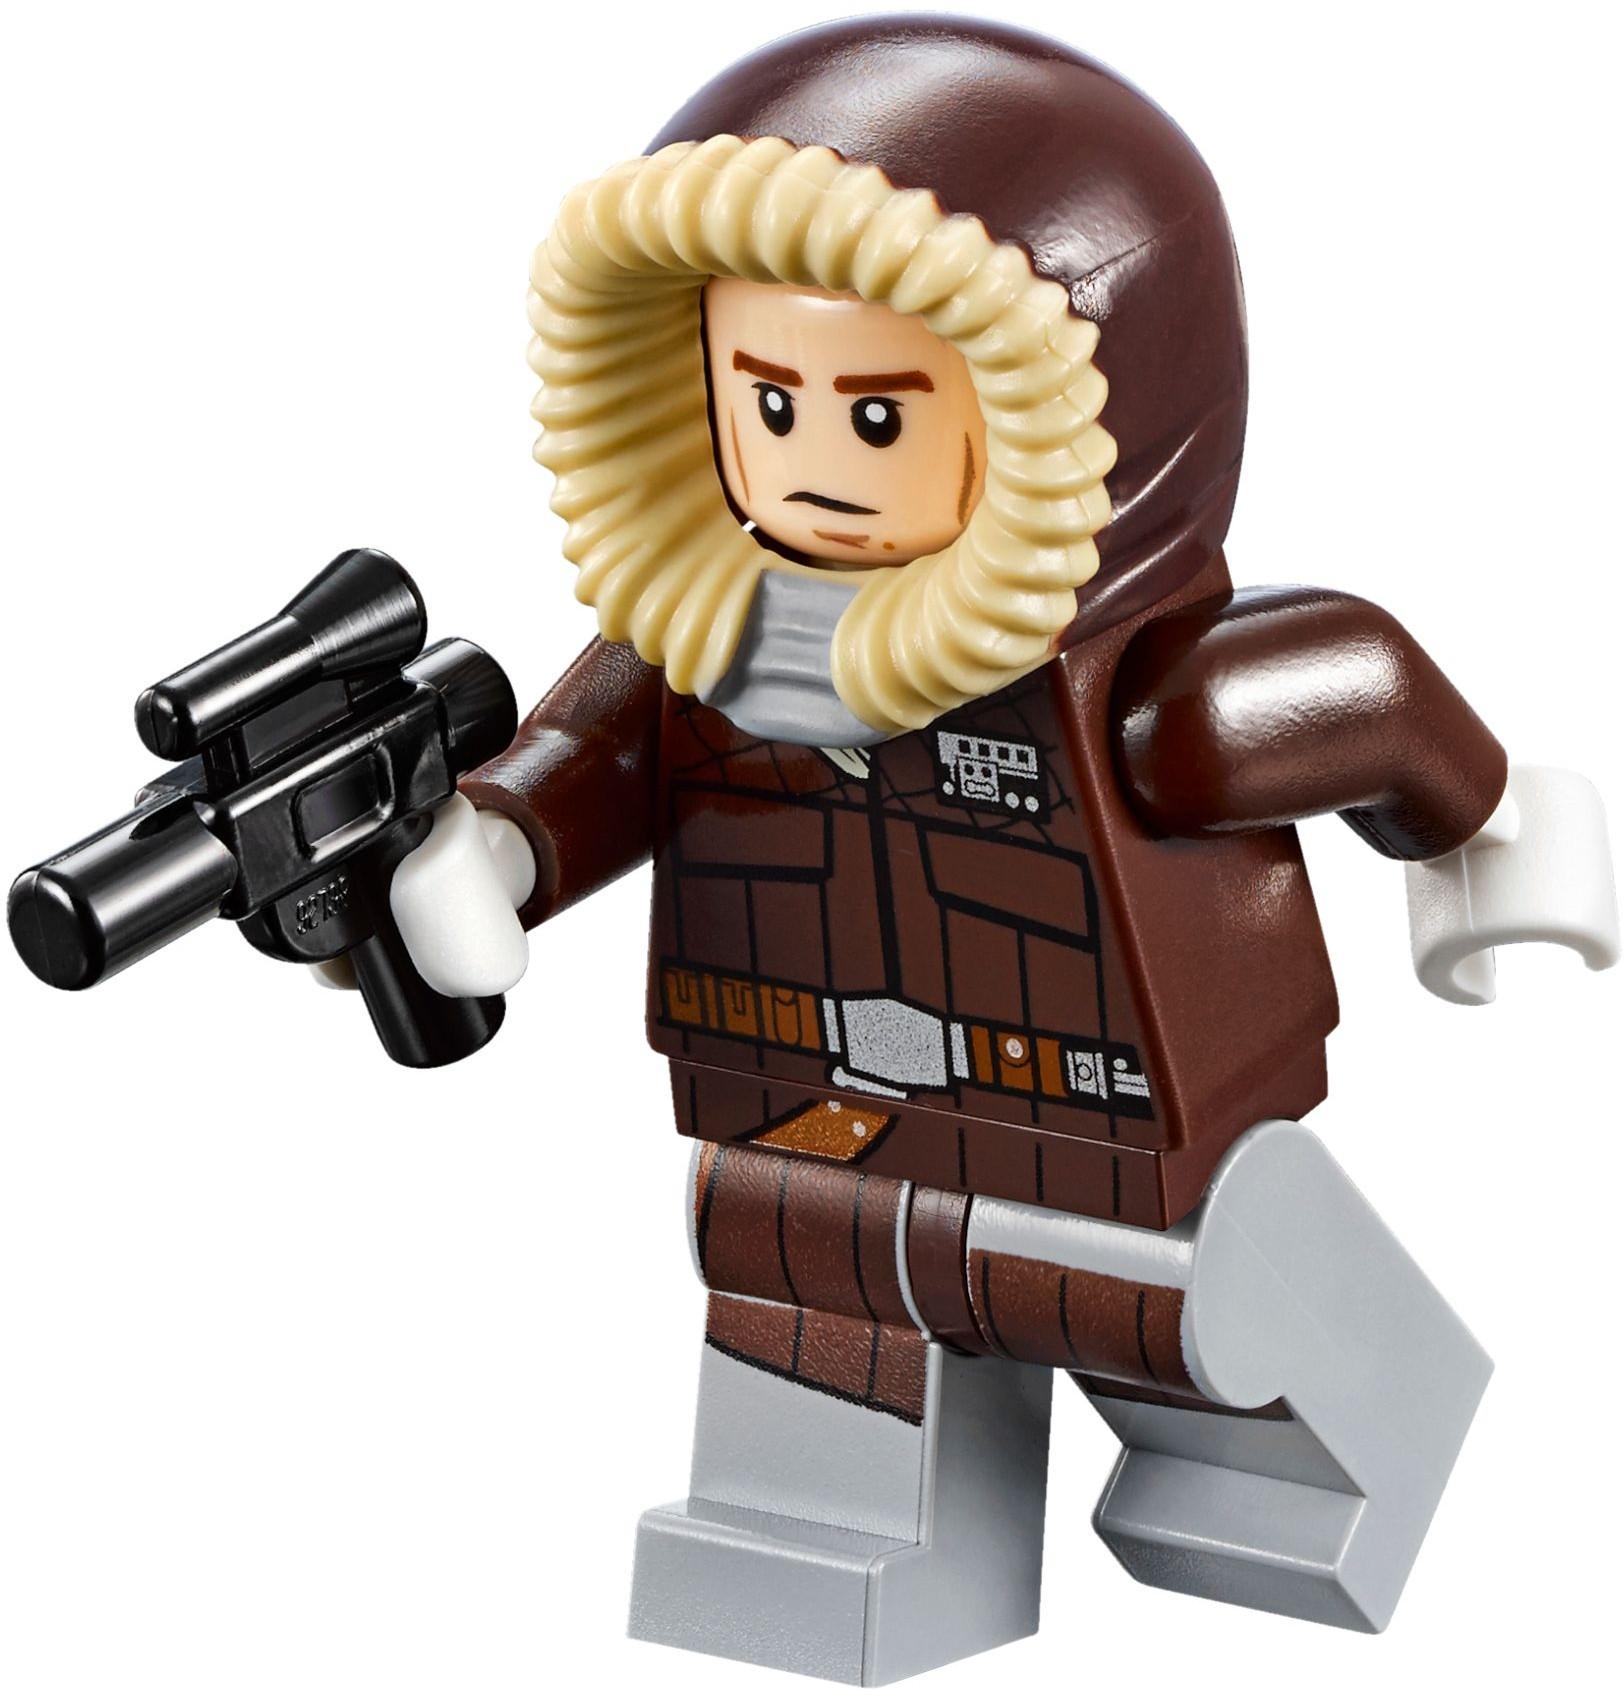 Han Solo | Hoth Attack